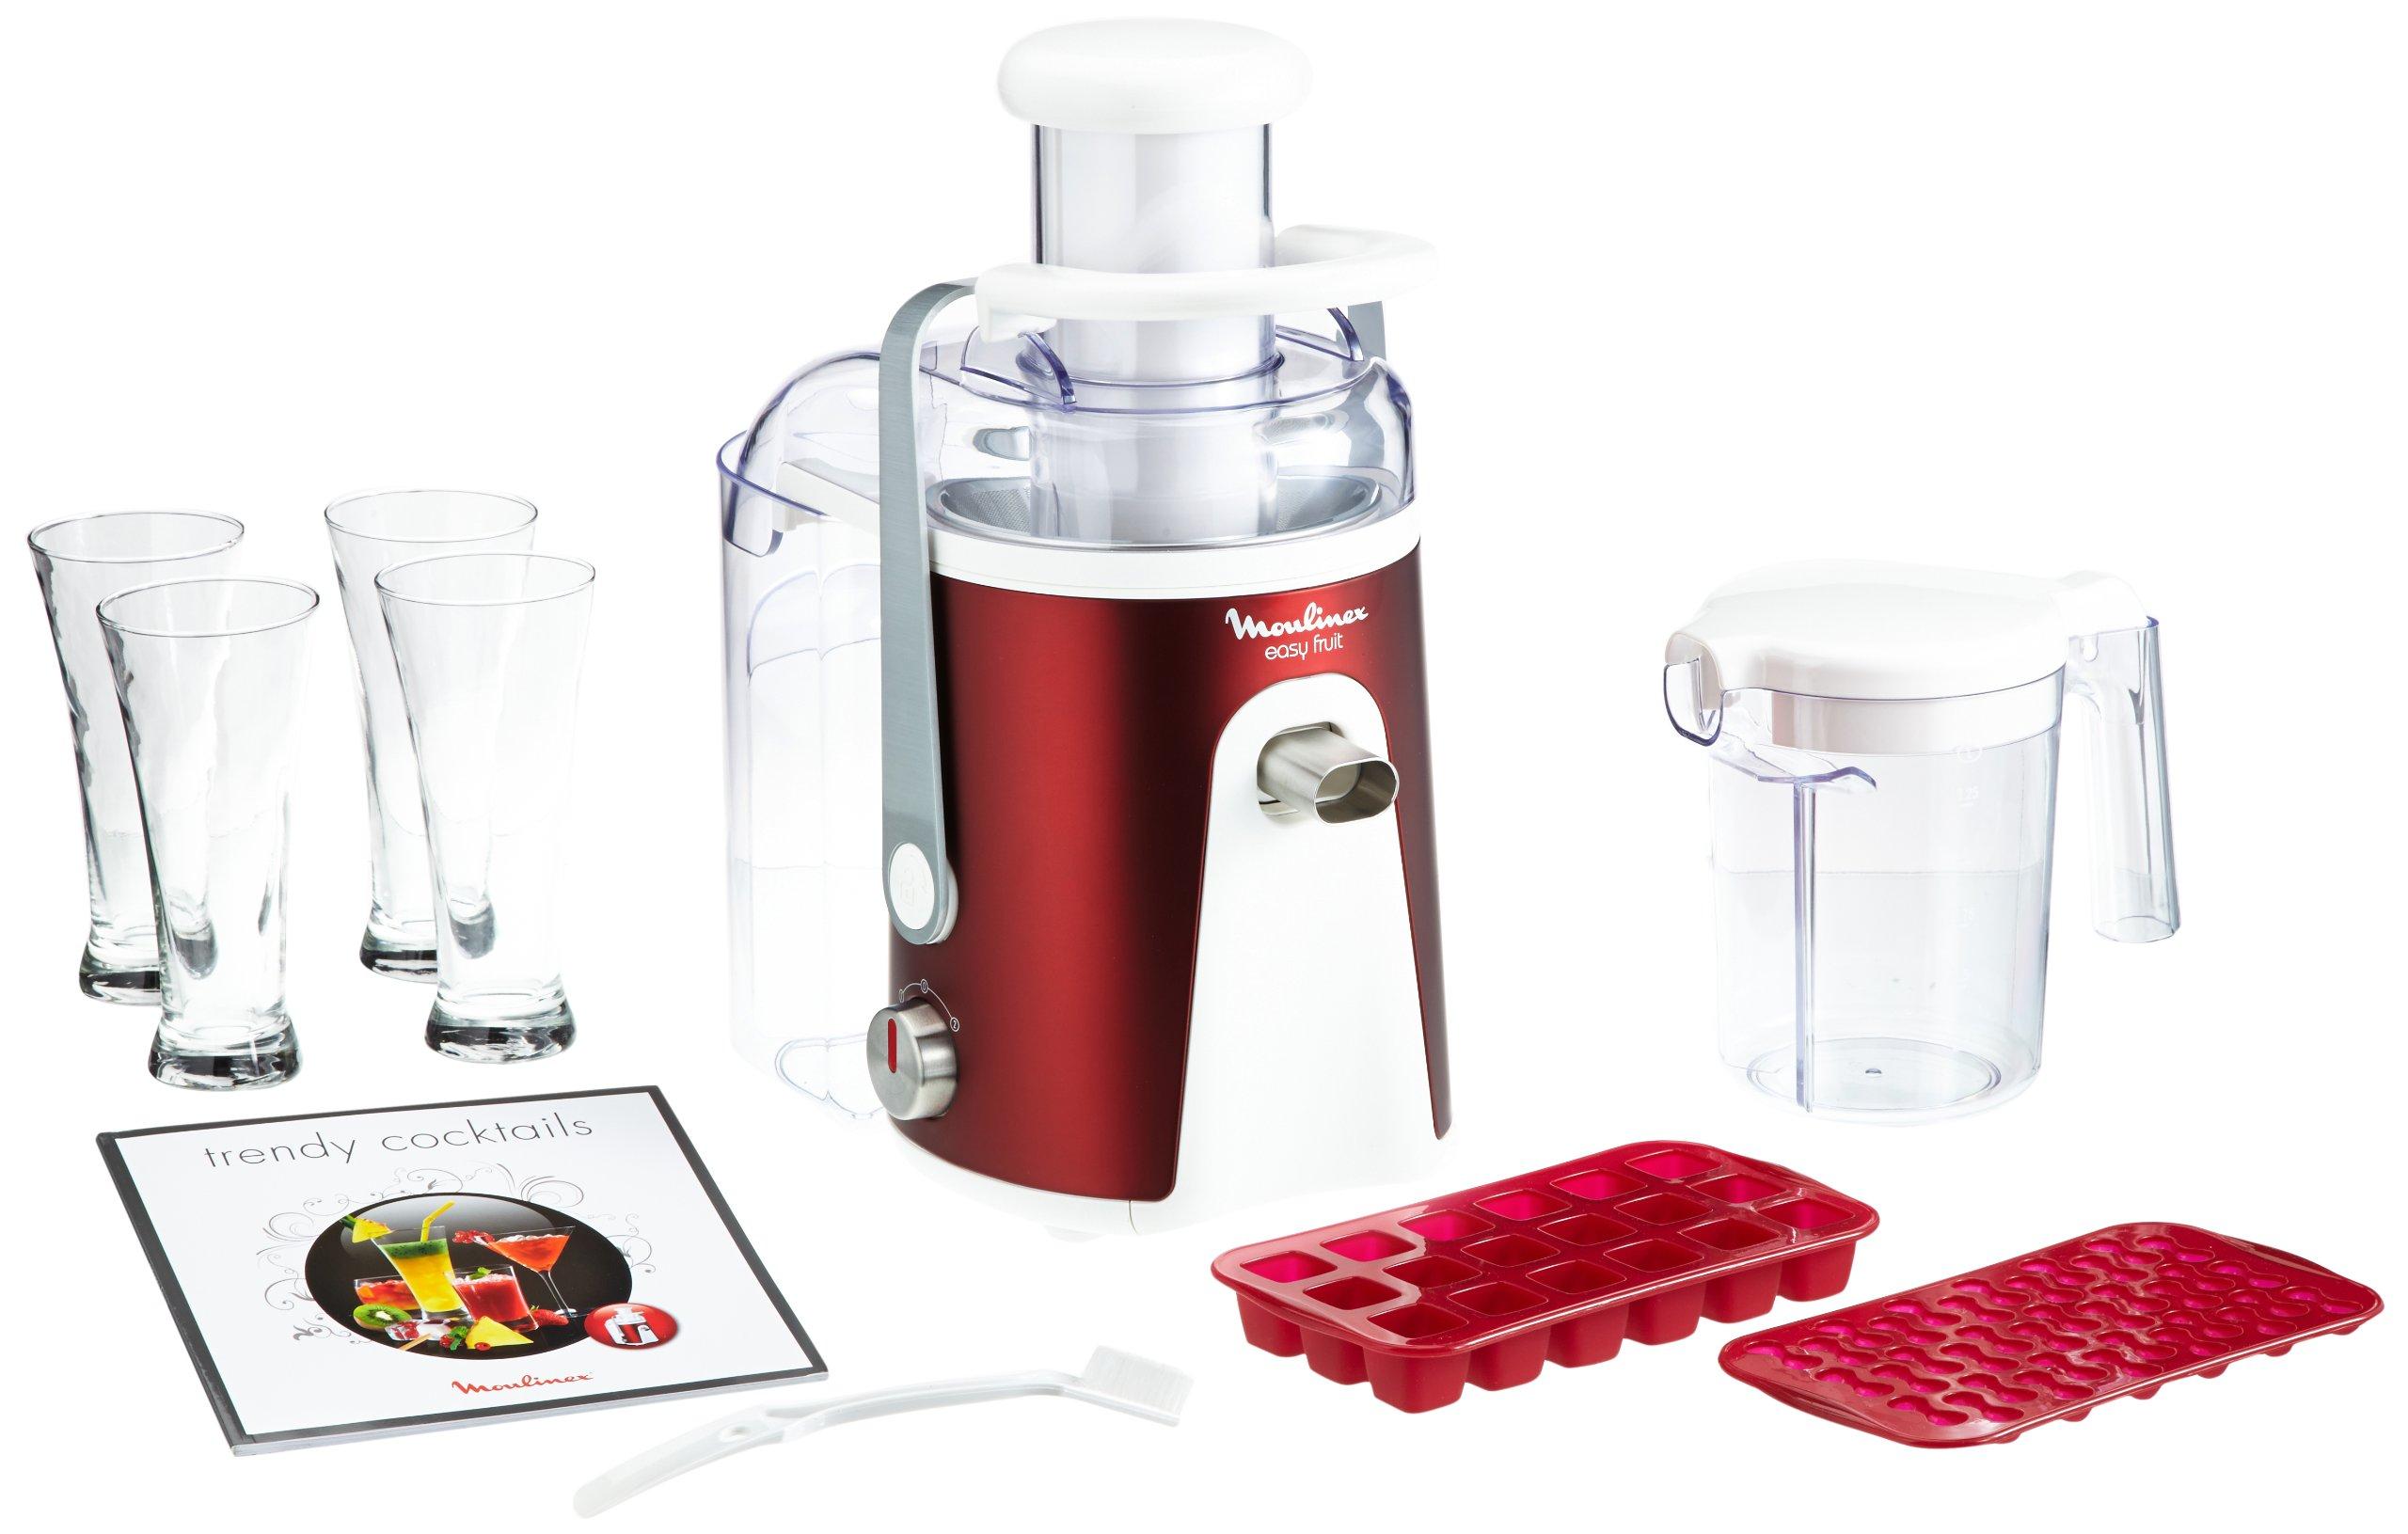 Moulinex JU587G - Exprimidor eléctrico, color rojo: Amazon.es: Hogar